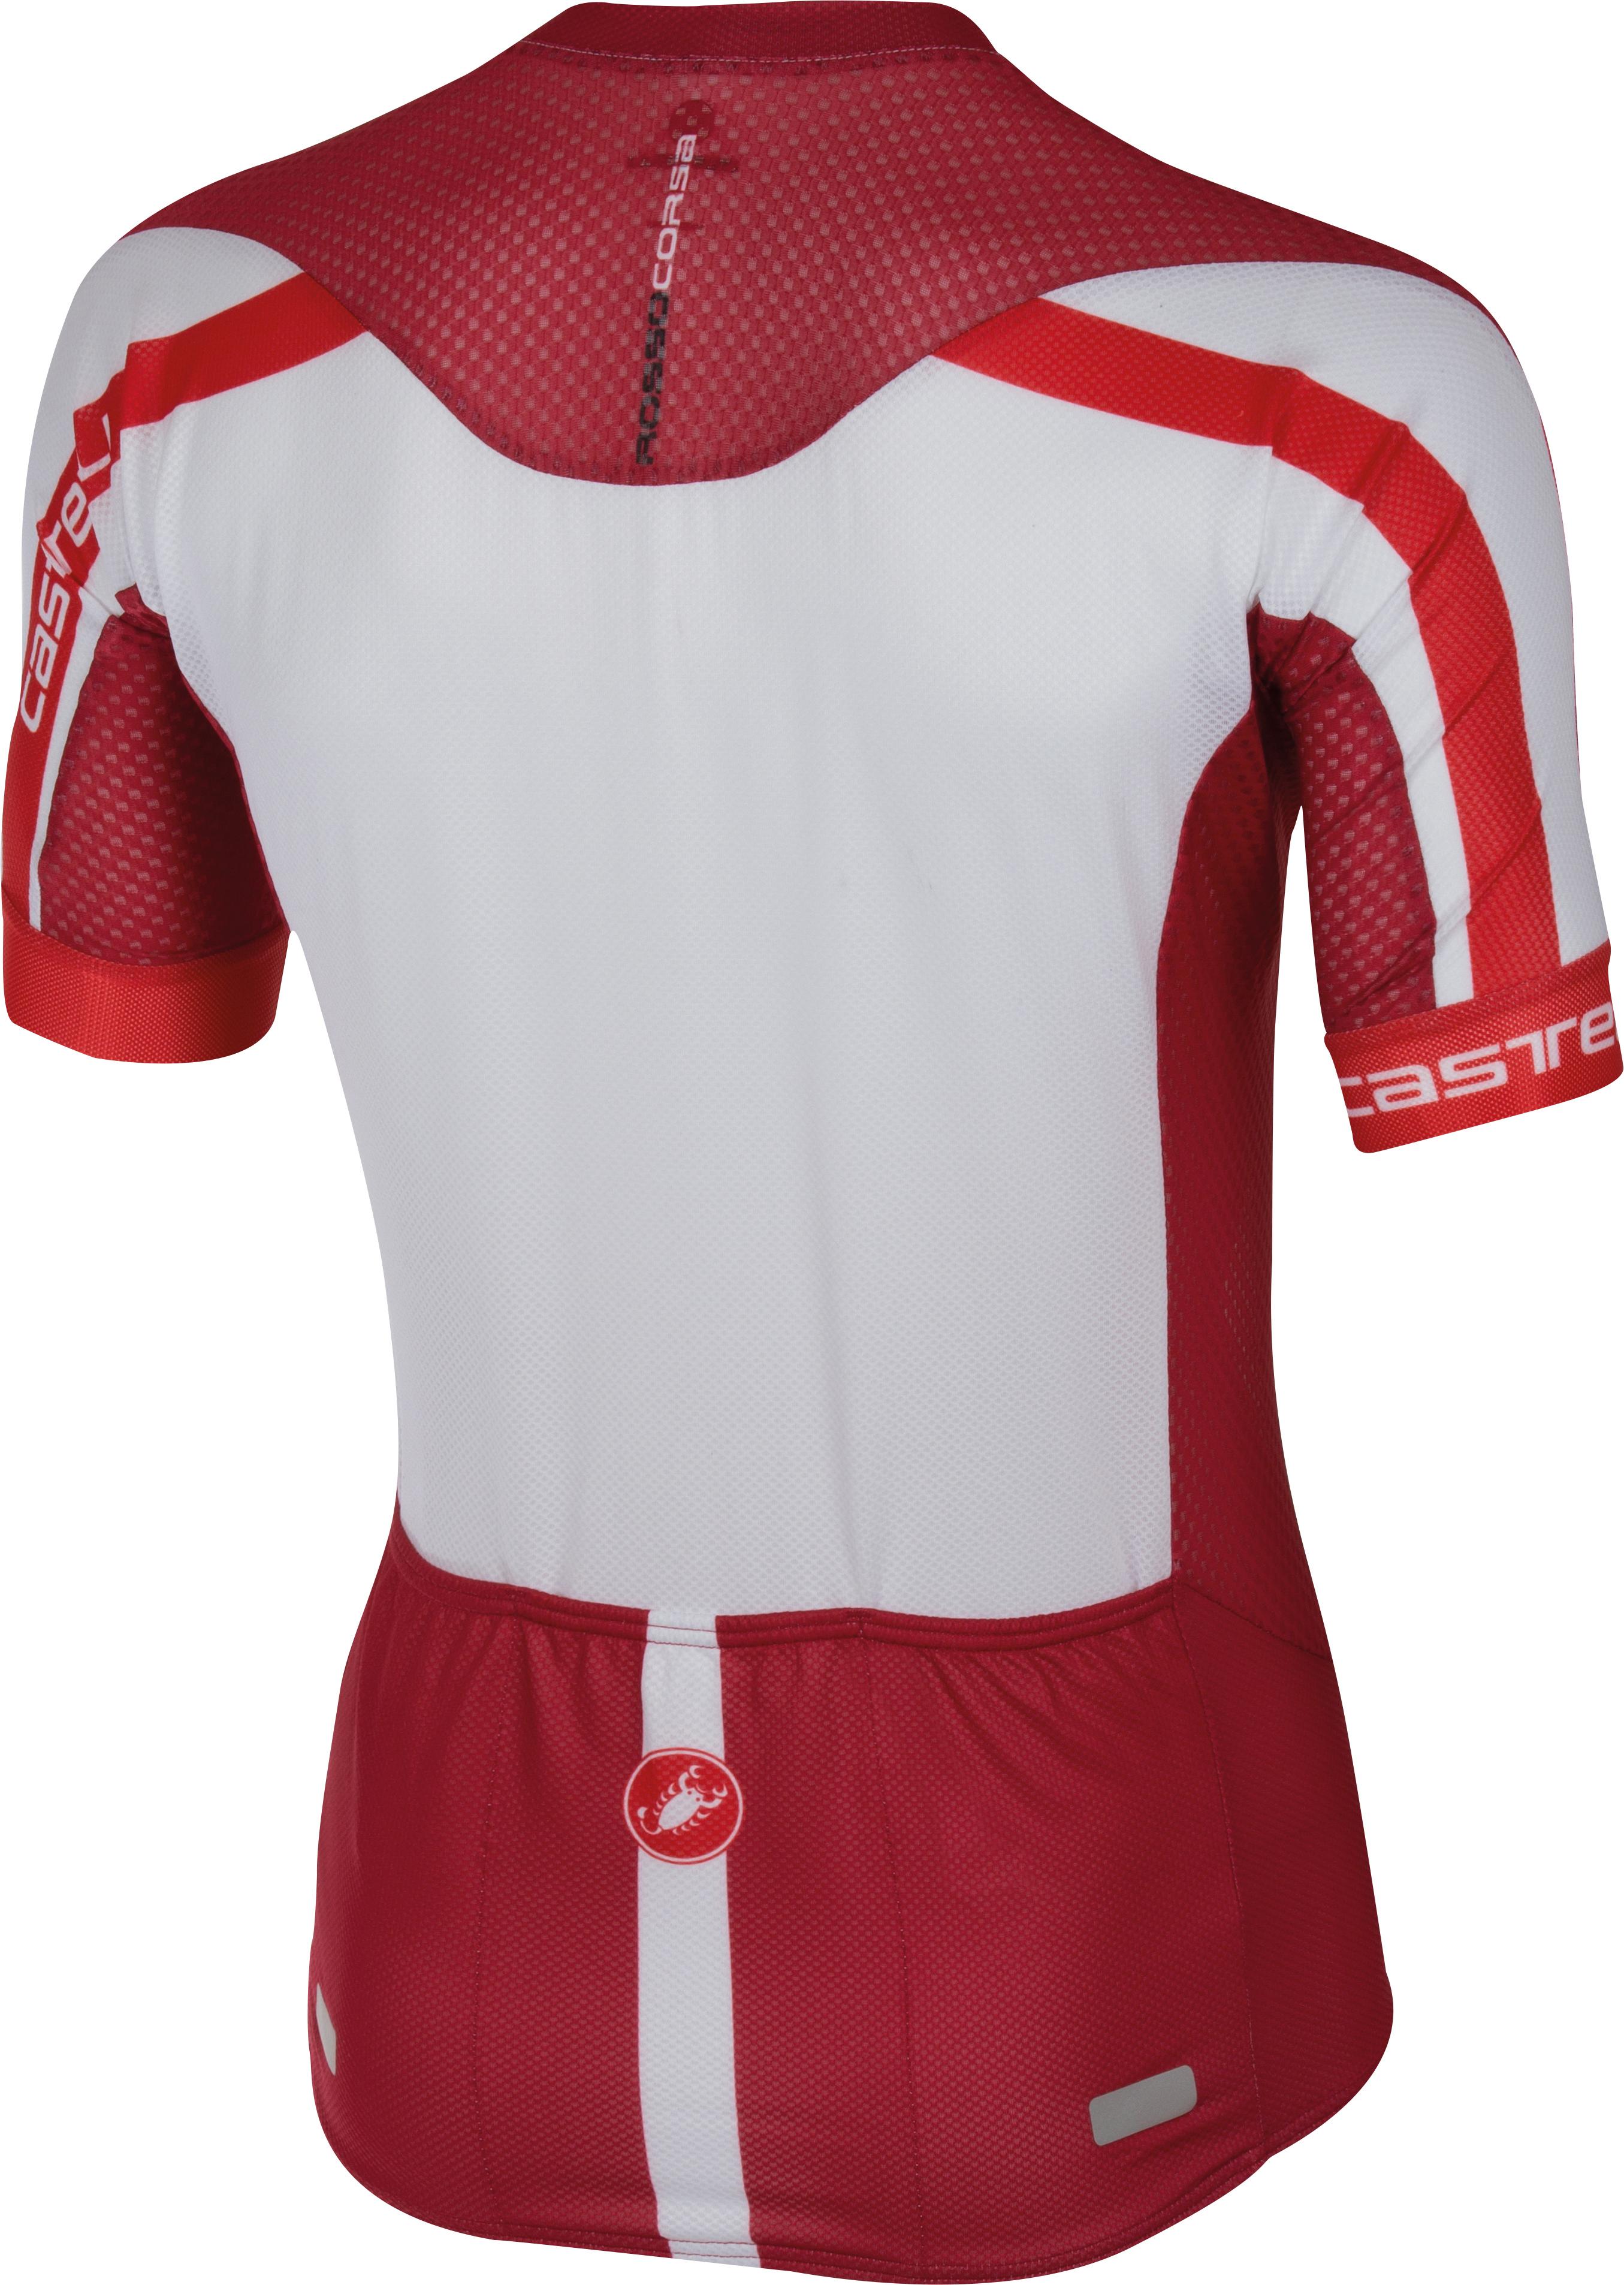 75fef953b Castelli Climber s 2.0 Short Sleeve Jersey FZ - Men s